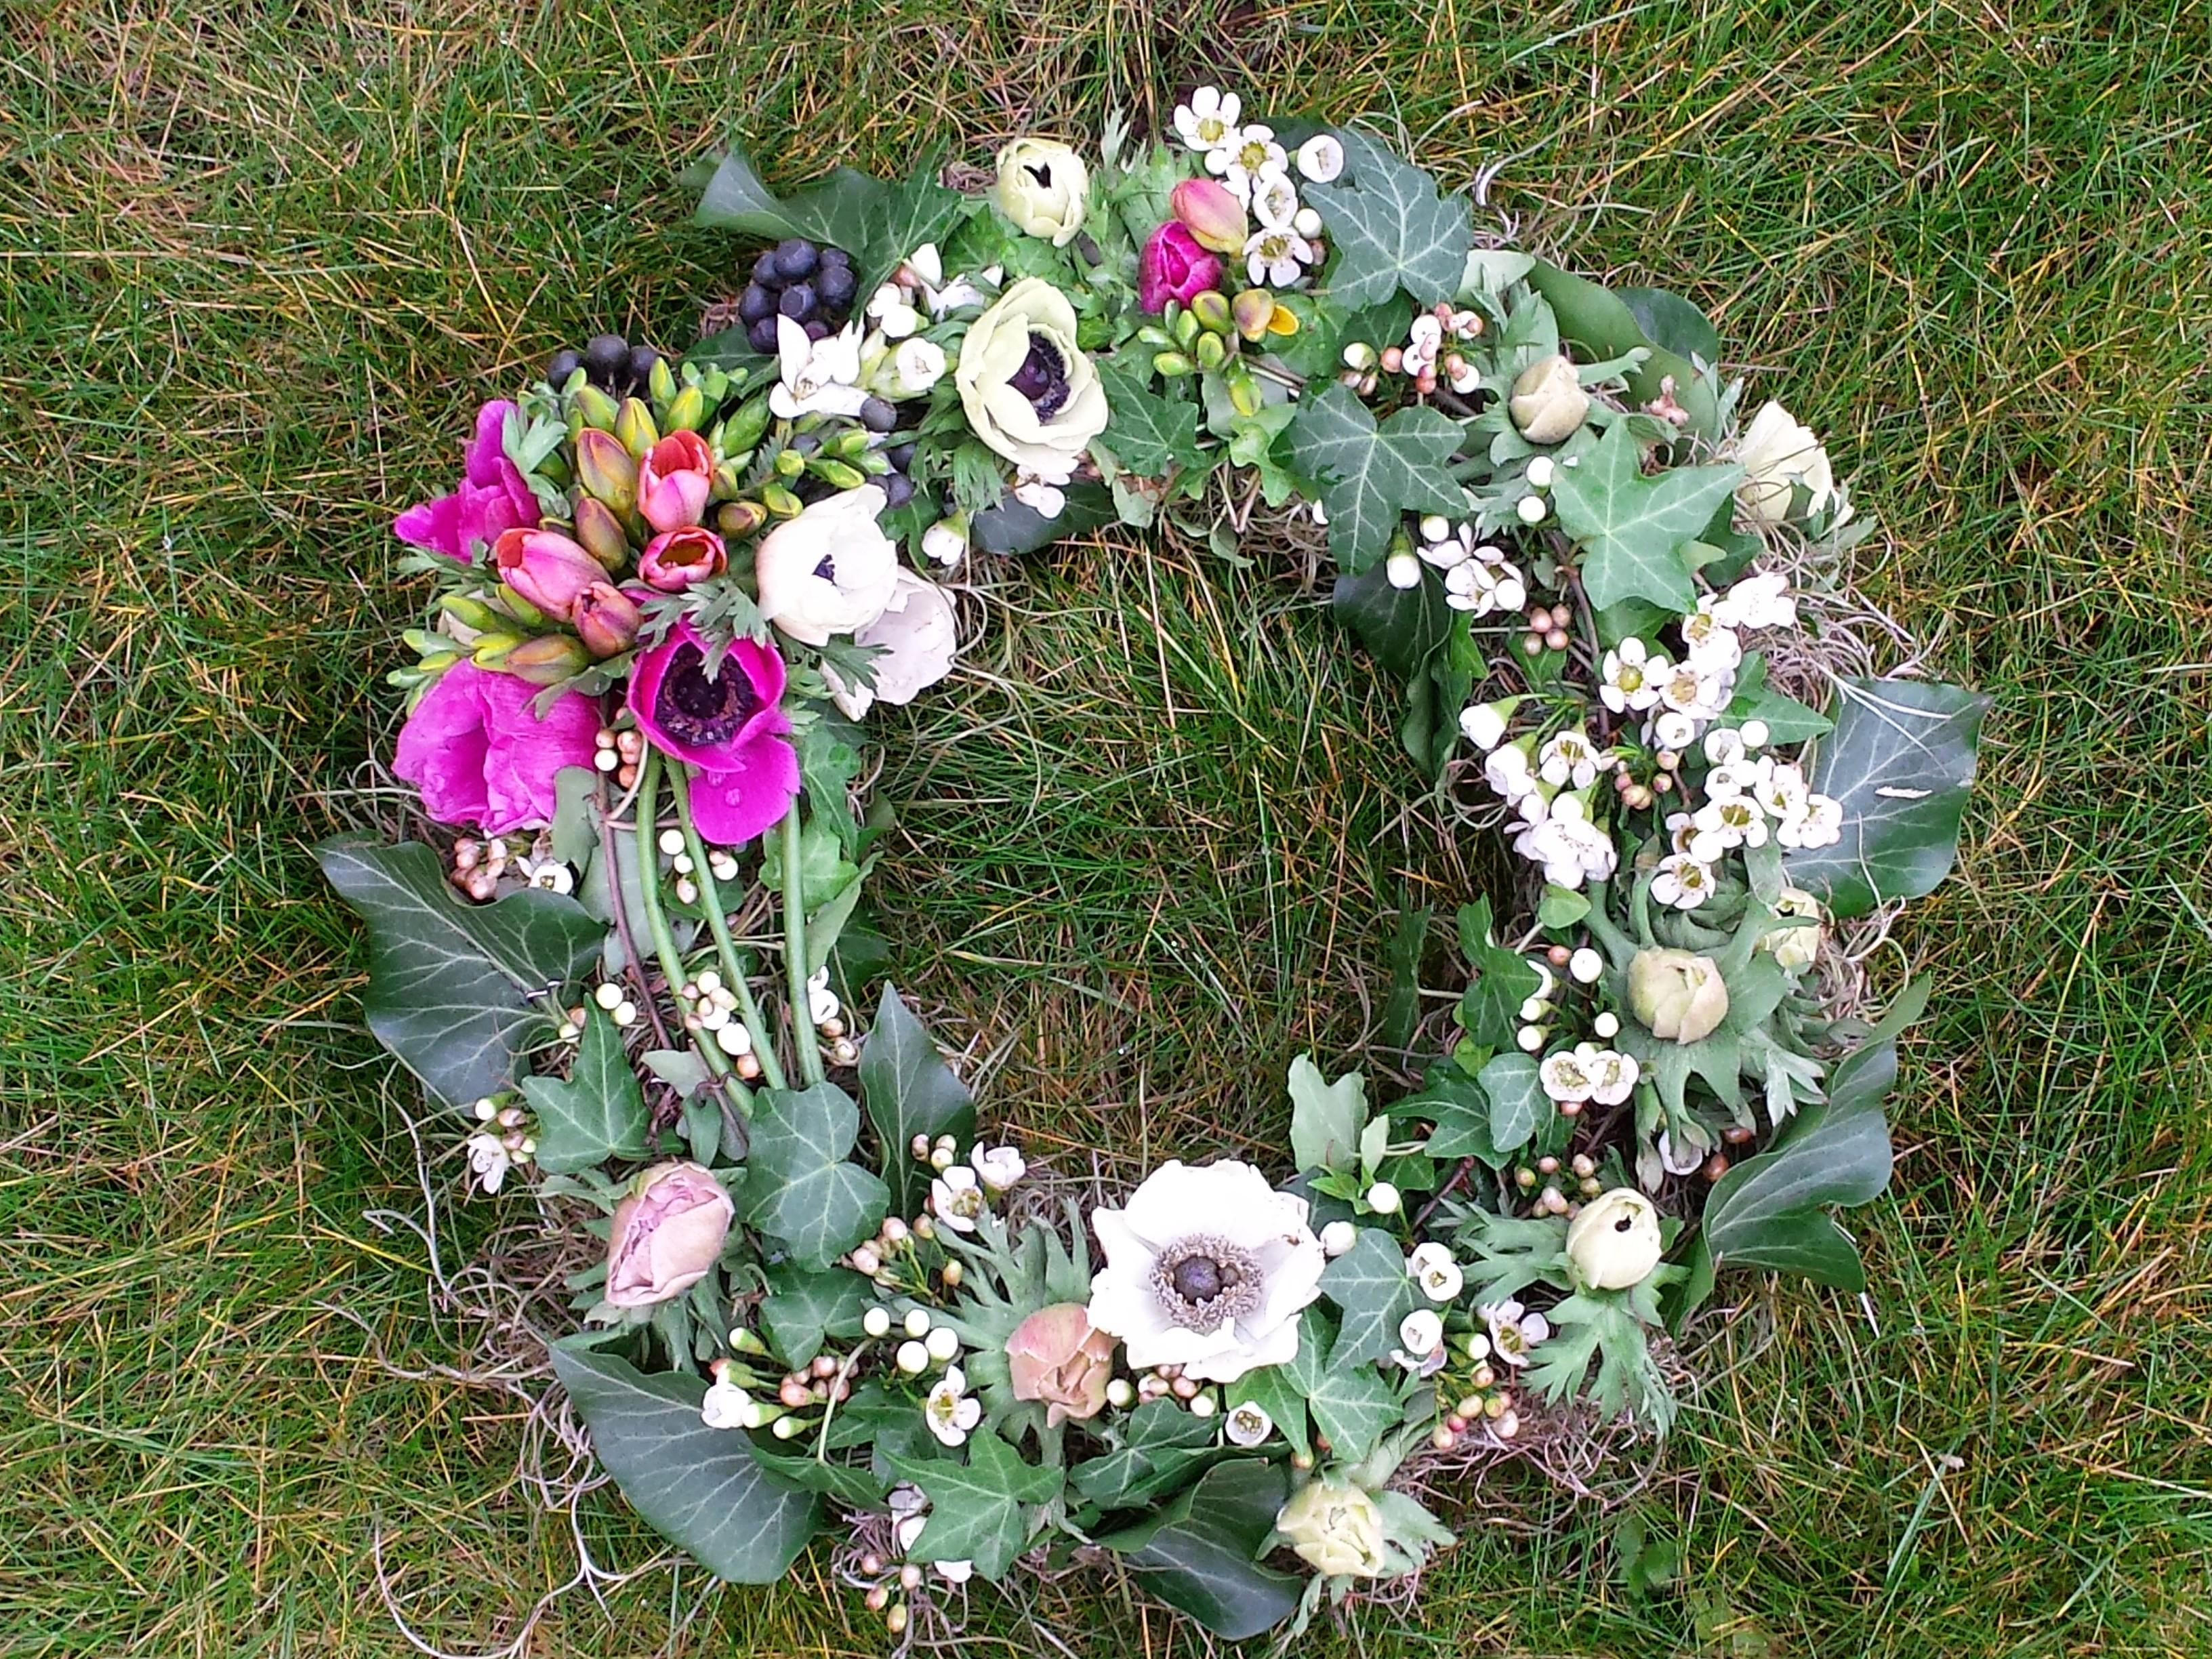 Anemone woodland funeral wreath